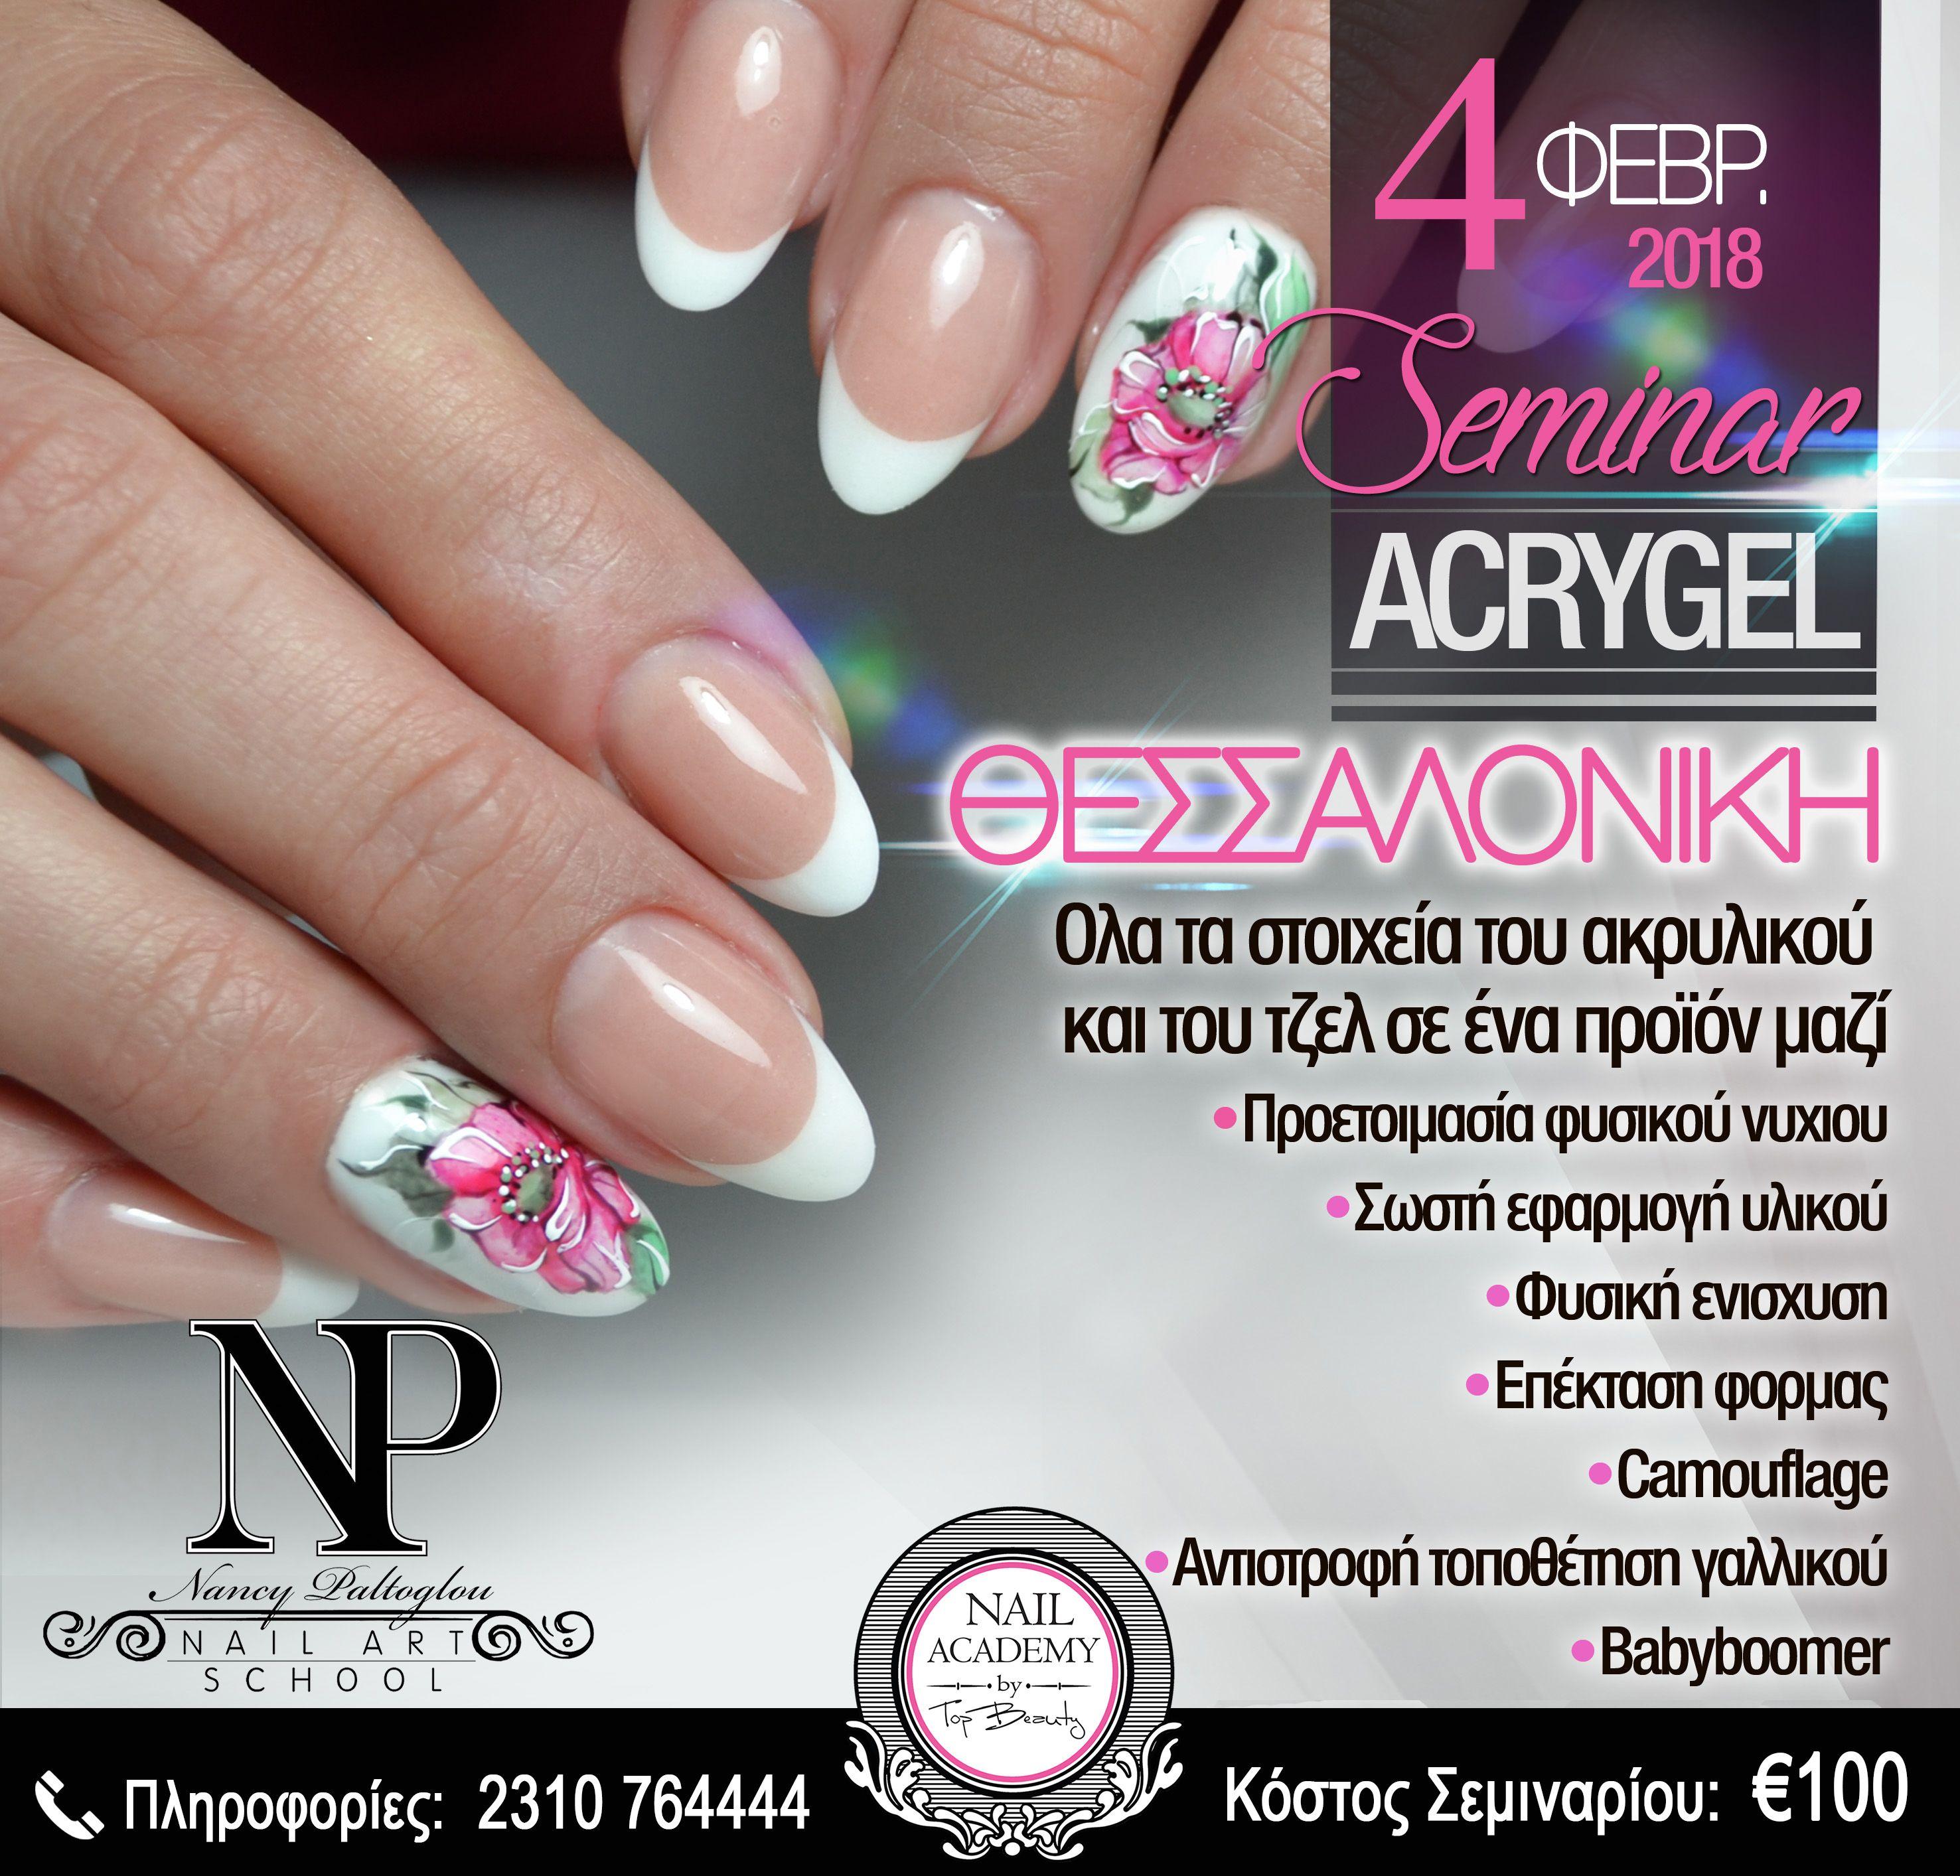 Seminar Acrygel With Nancy Paltoglou At Top Beauty Nail Academy